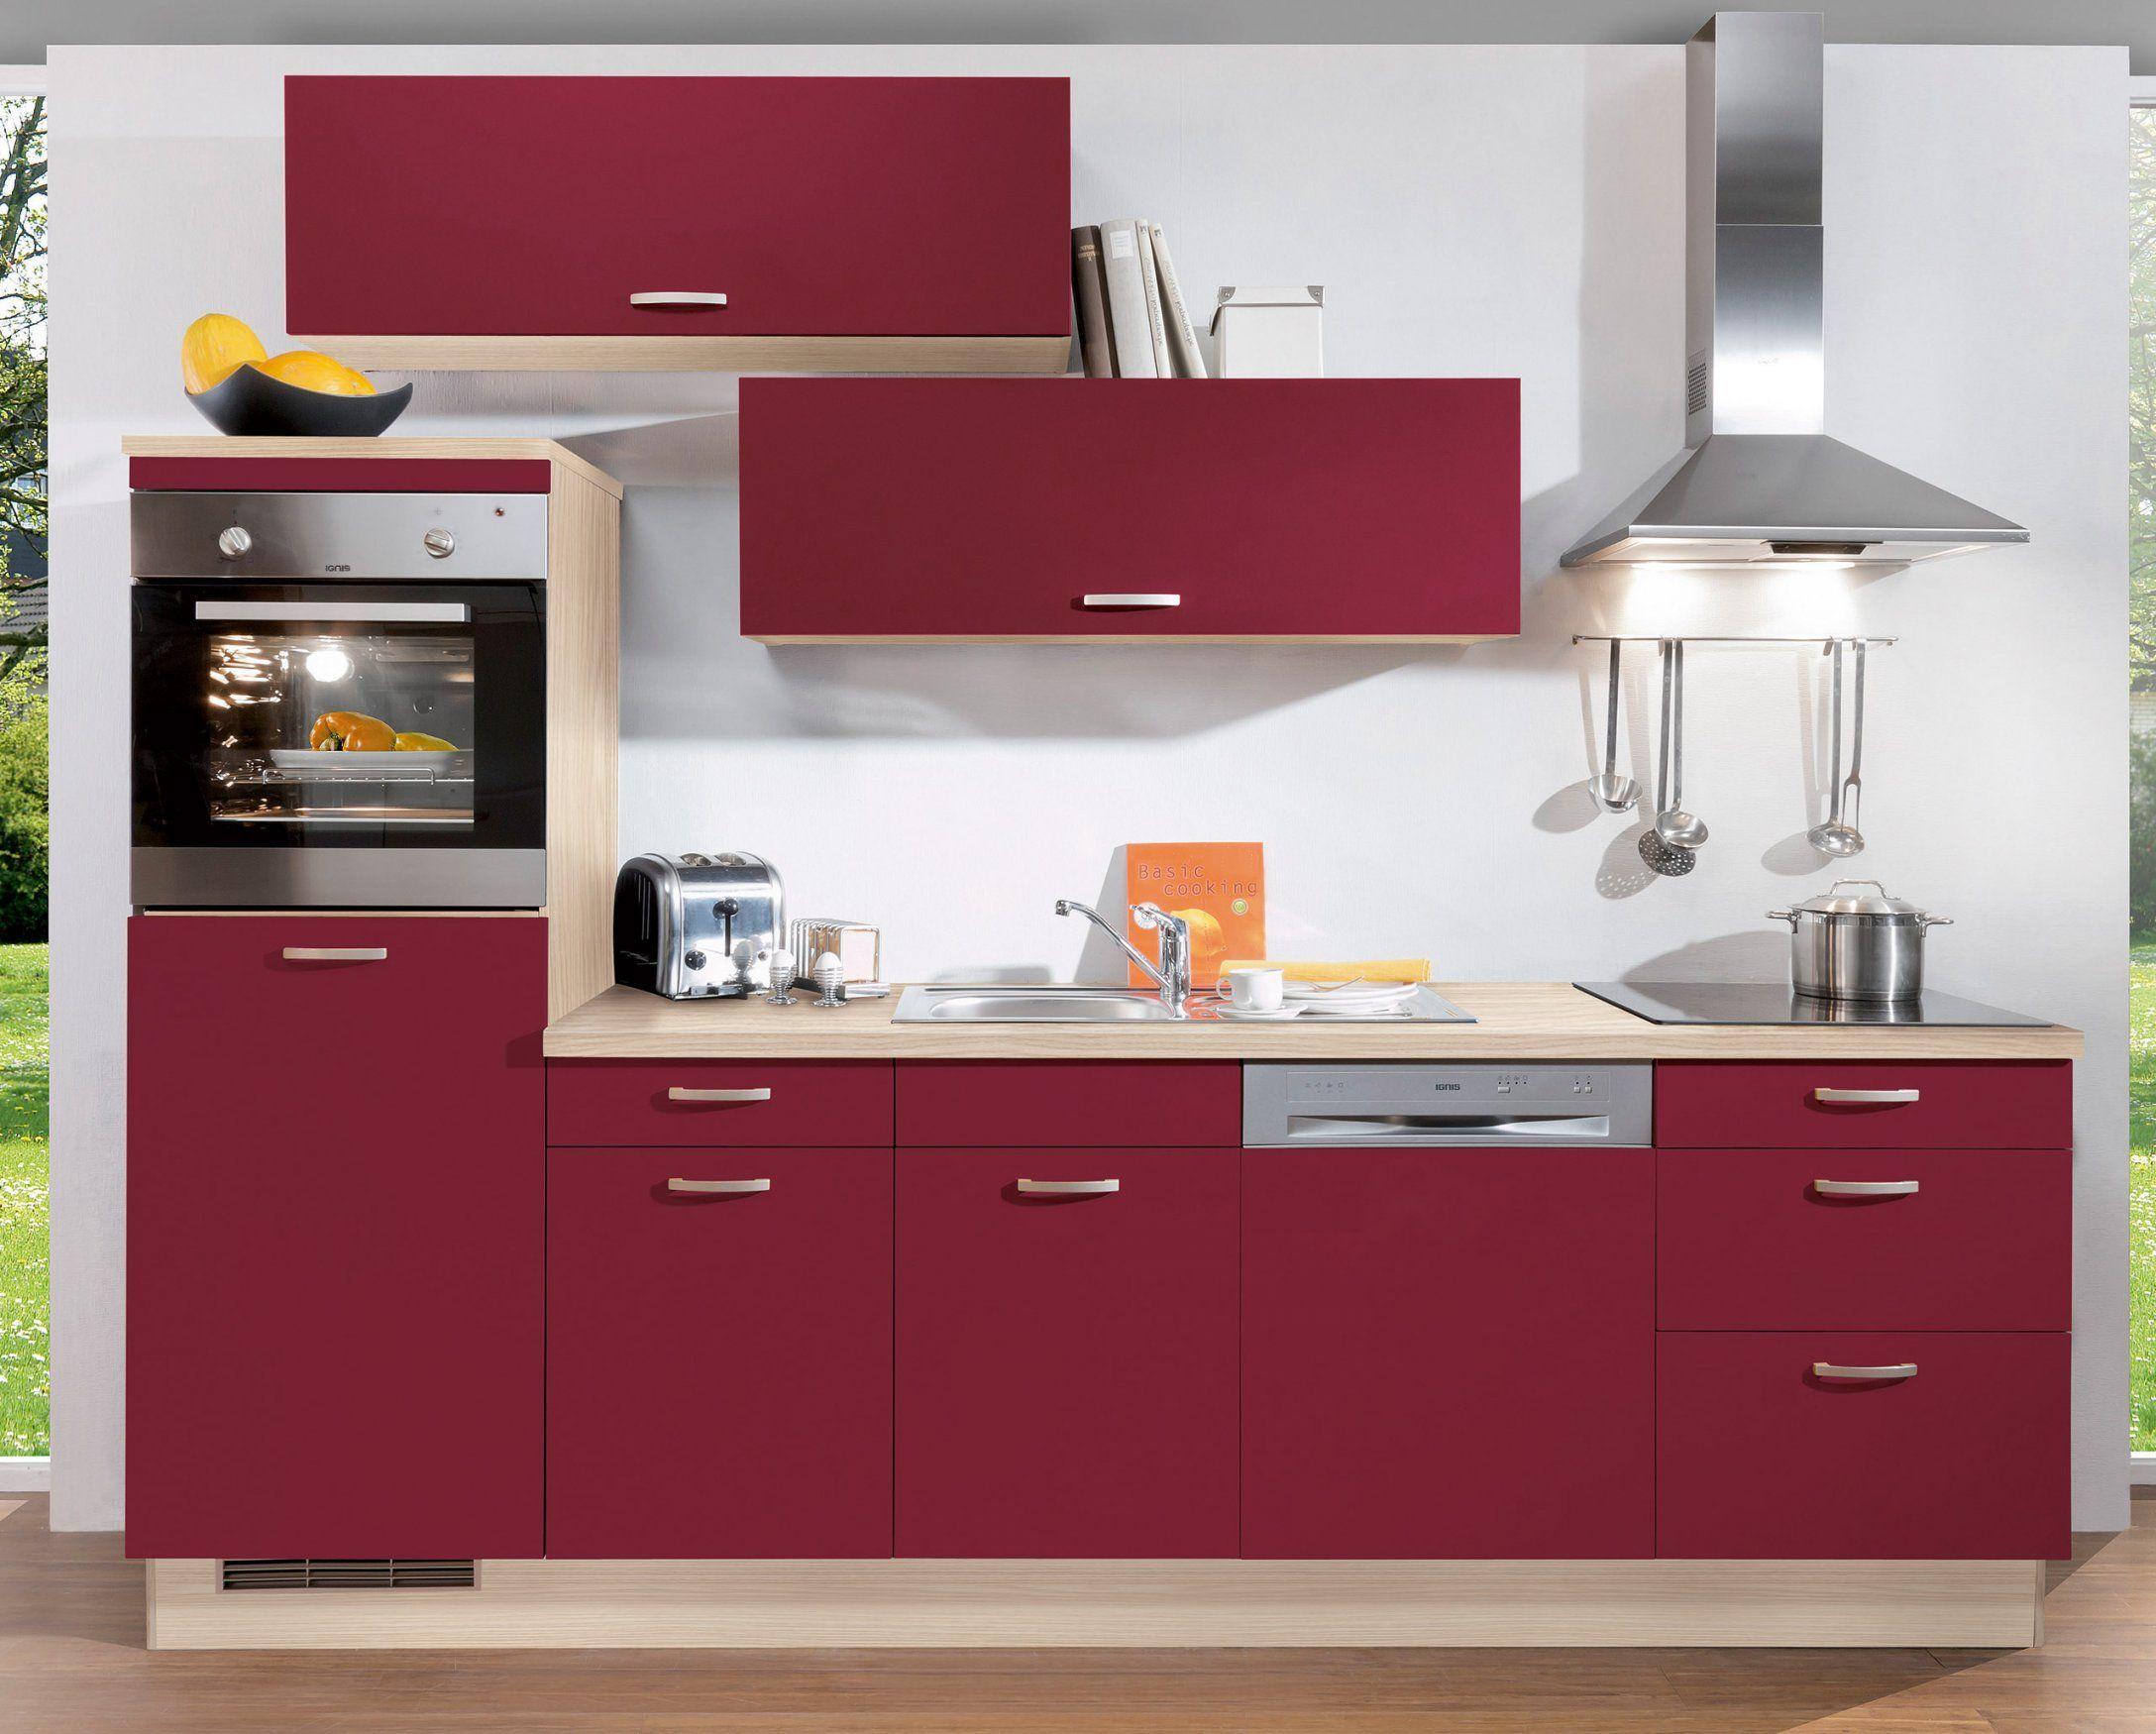 Einbaukuchen Mit Elektrogeraten Ikea Kuche Aufbauen Kuche